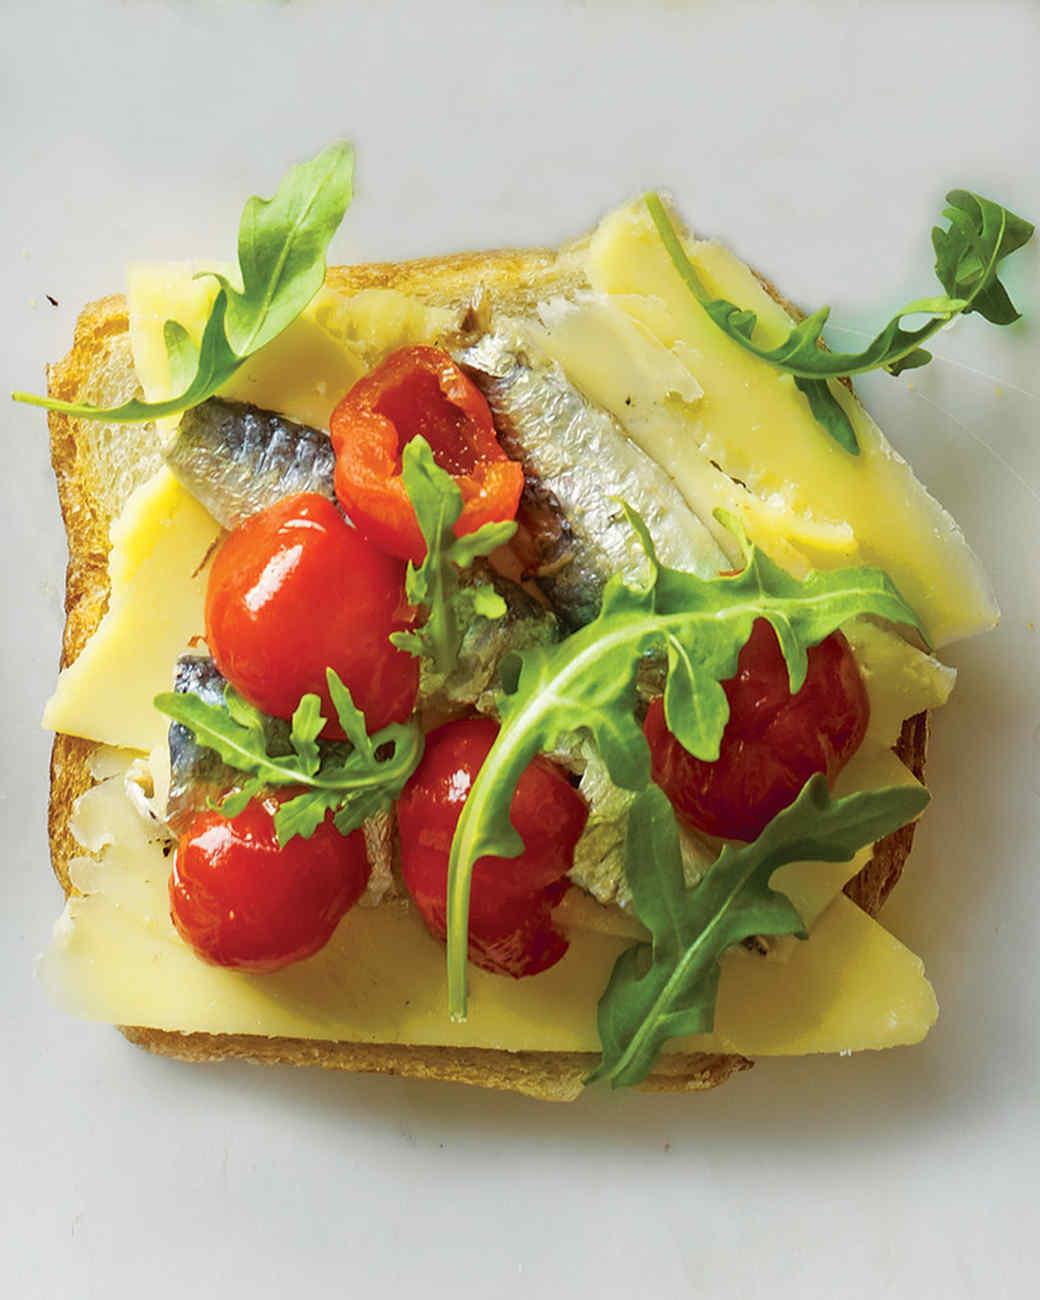 mld106119_1010_grill_sardine6.jpg